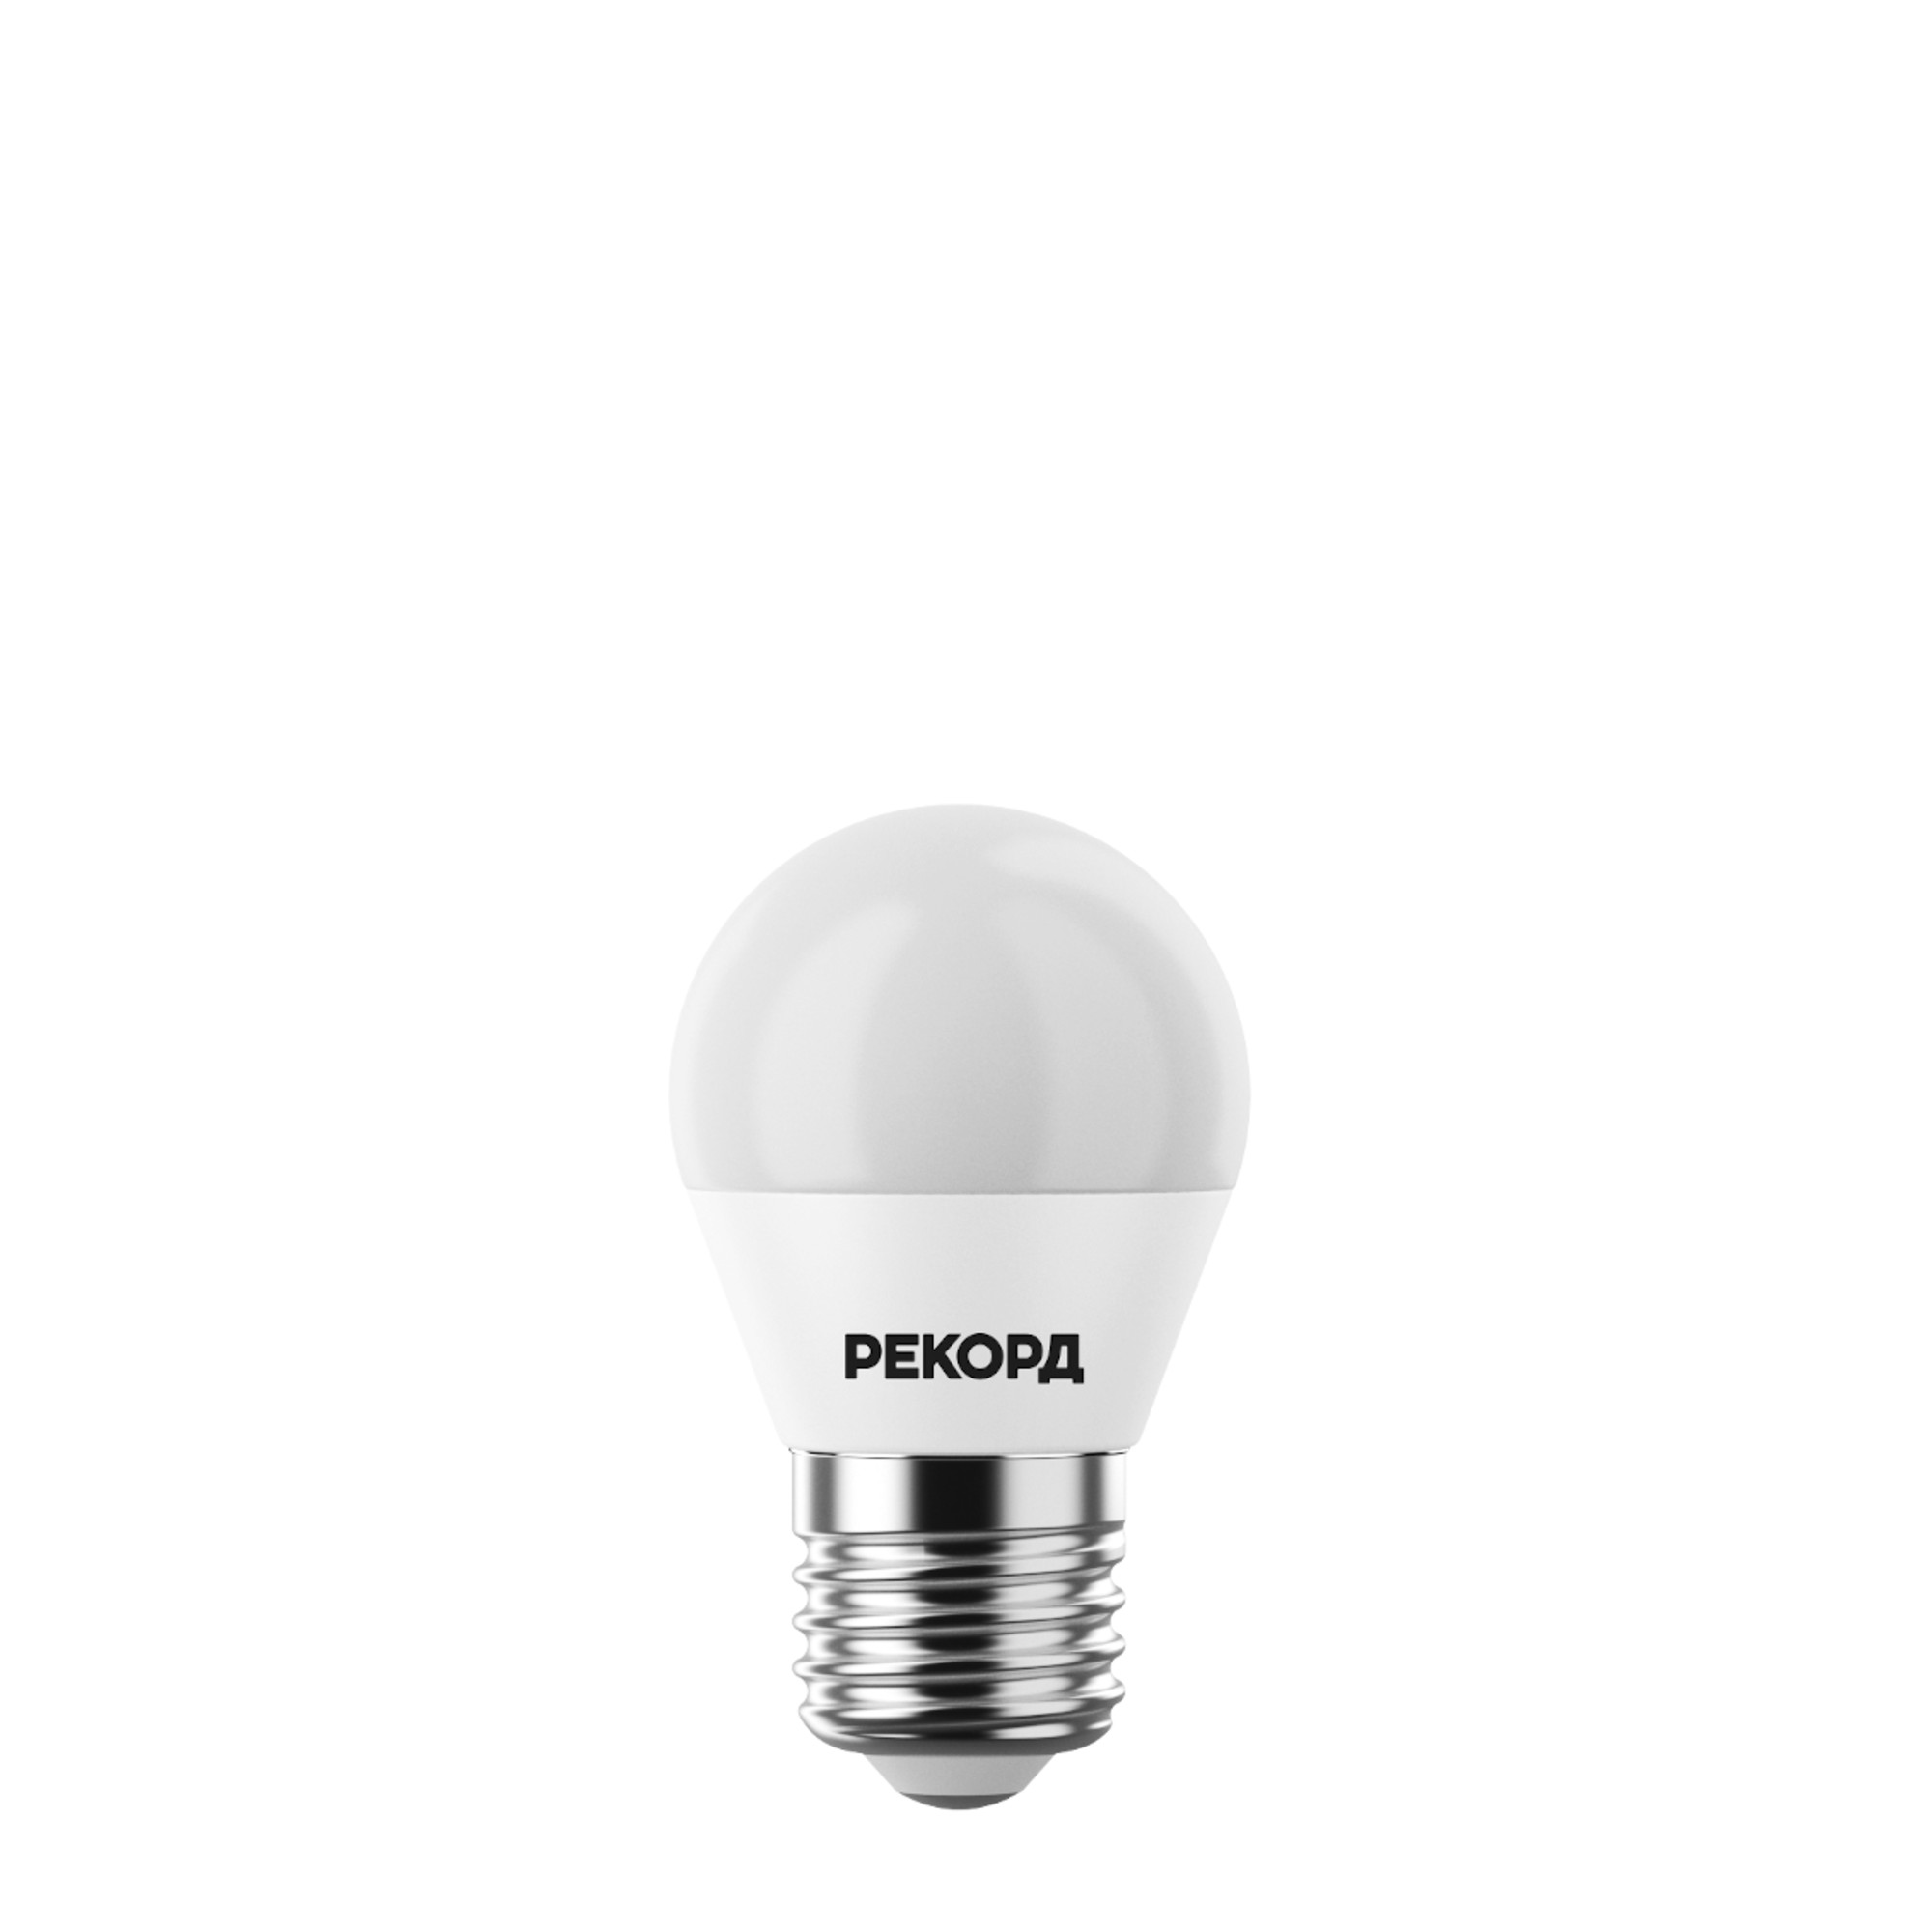 Светодиодная лампочка Рекорд 23886 E27 70 Лм 7 Вт